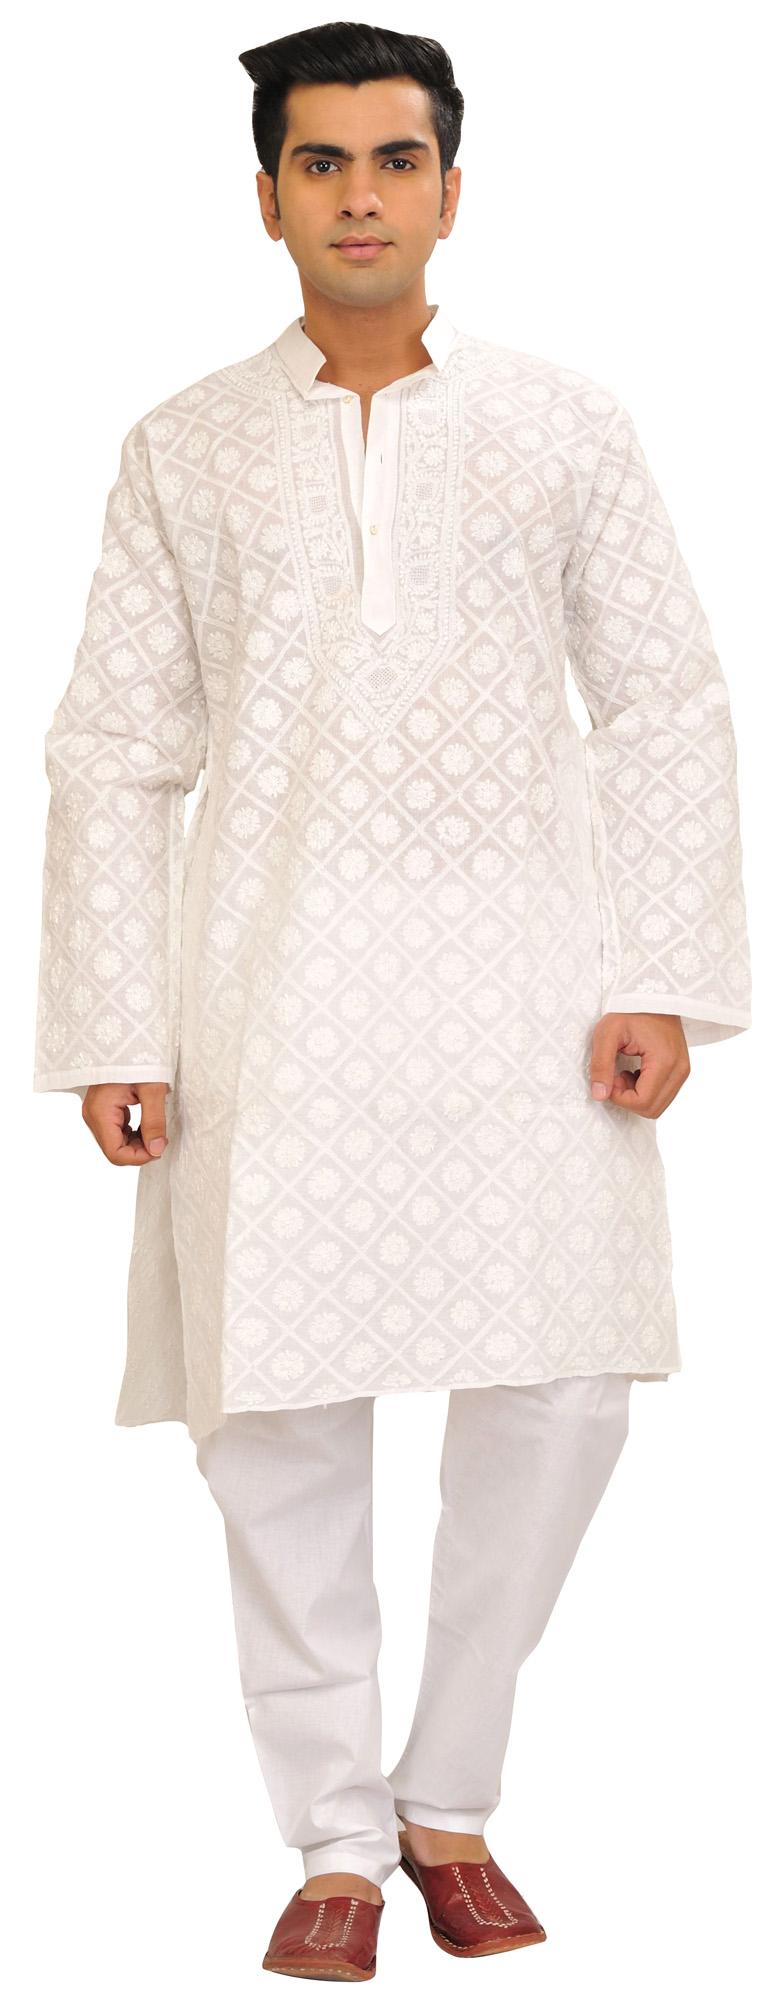 BrightWhite Kurta Pajama Set With Chikan HandEmbroidery